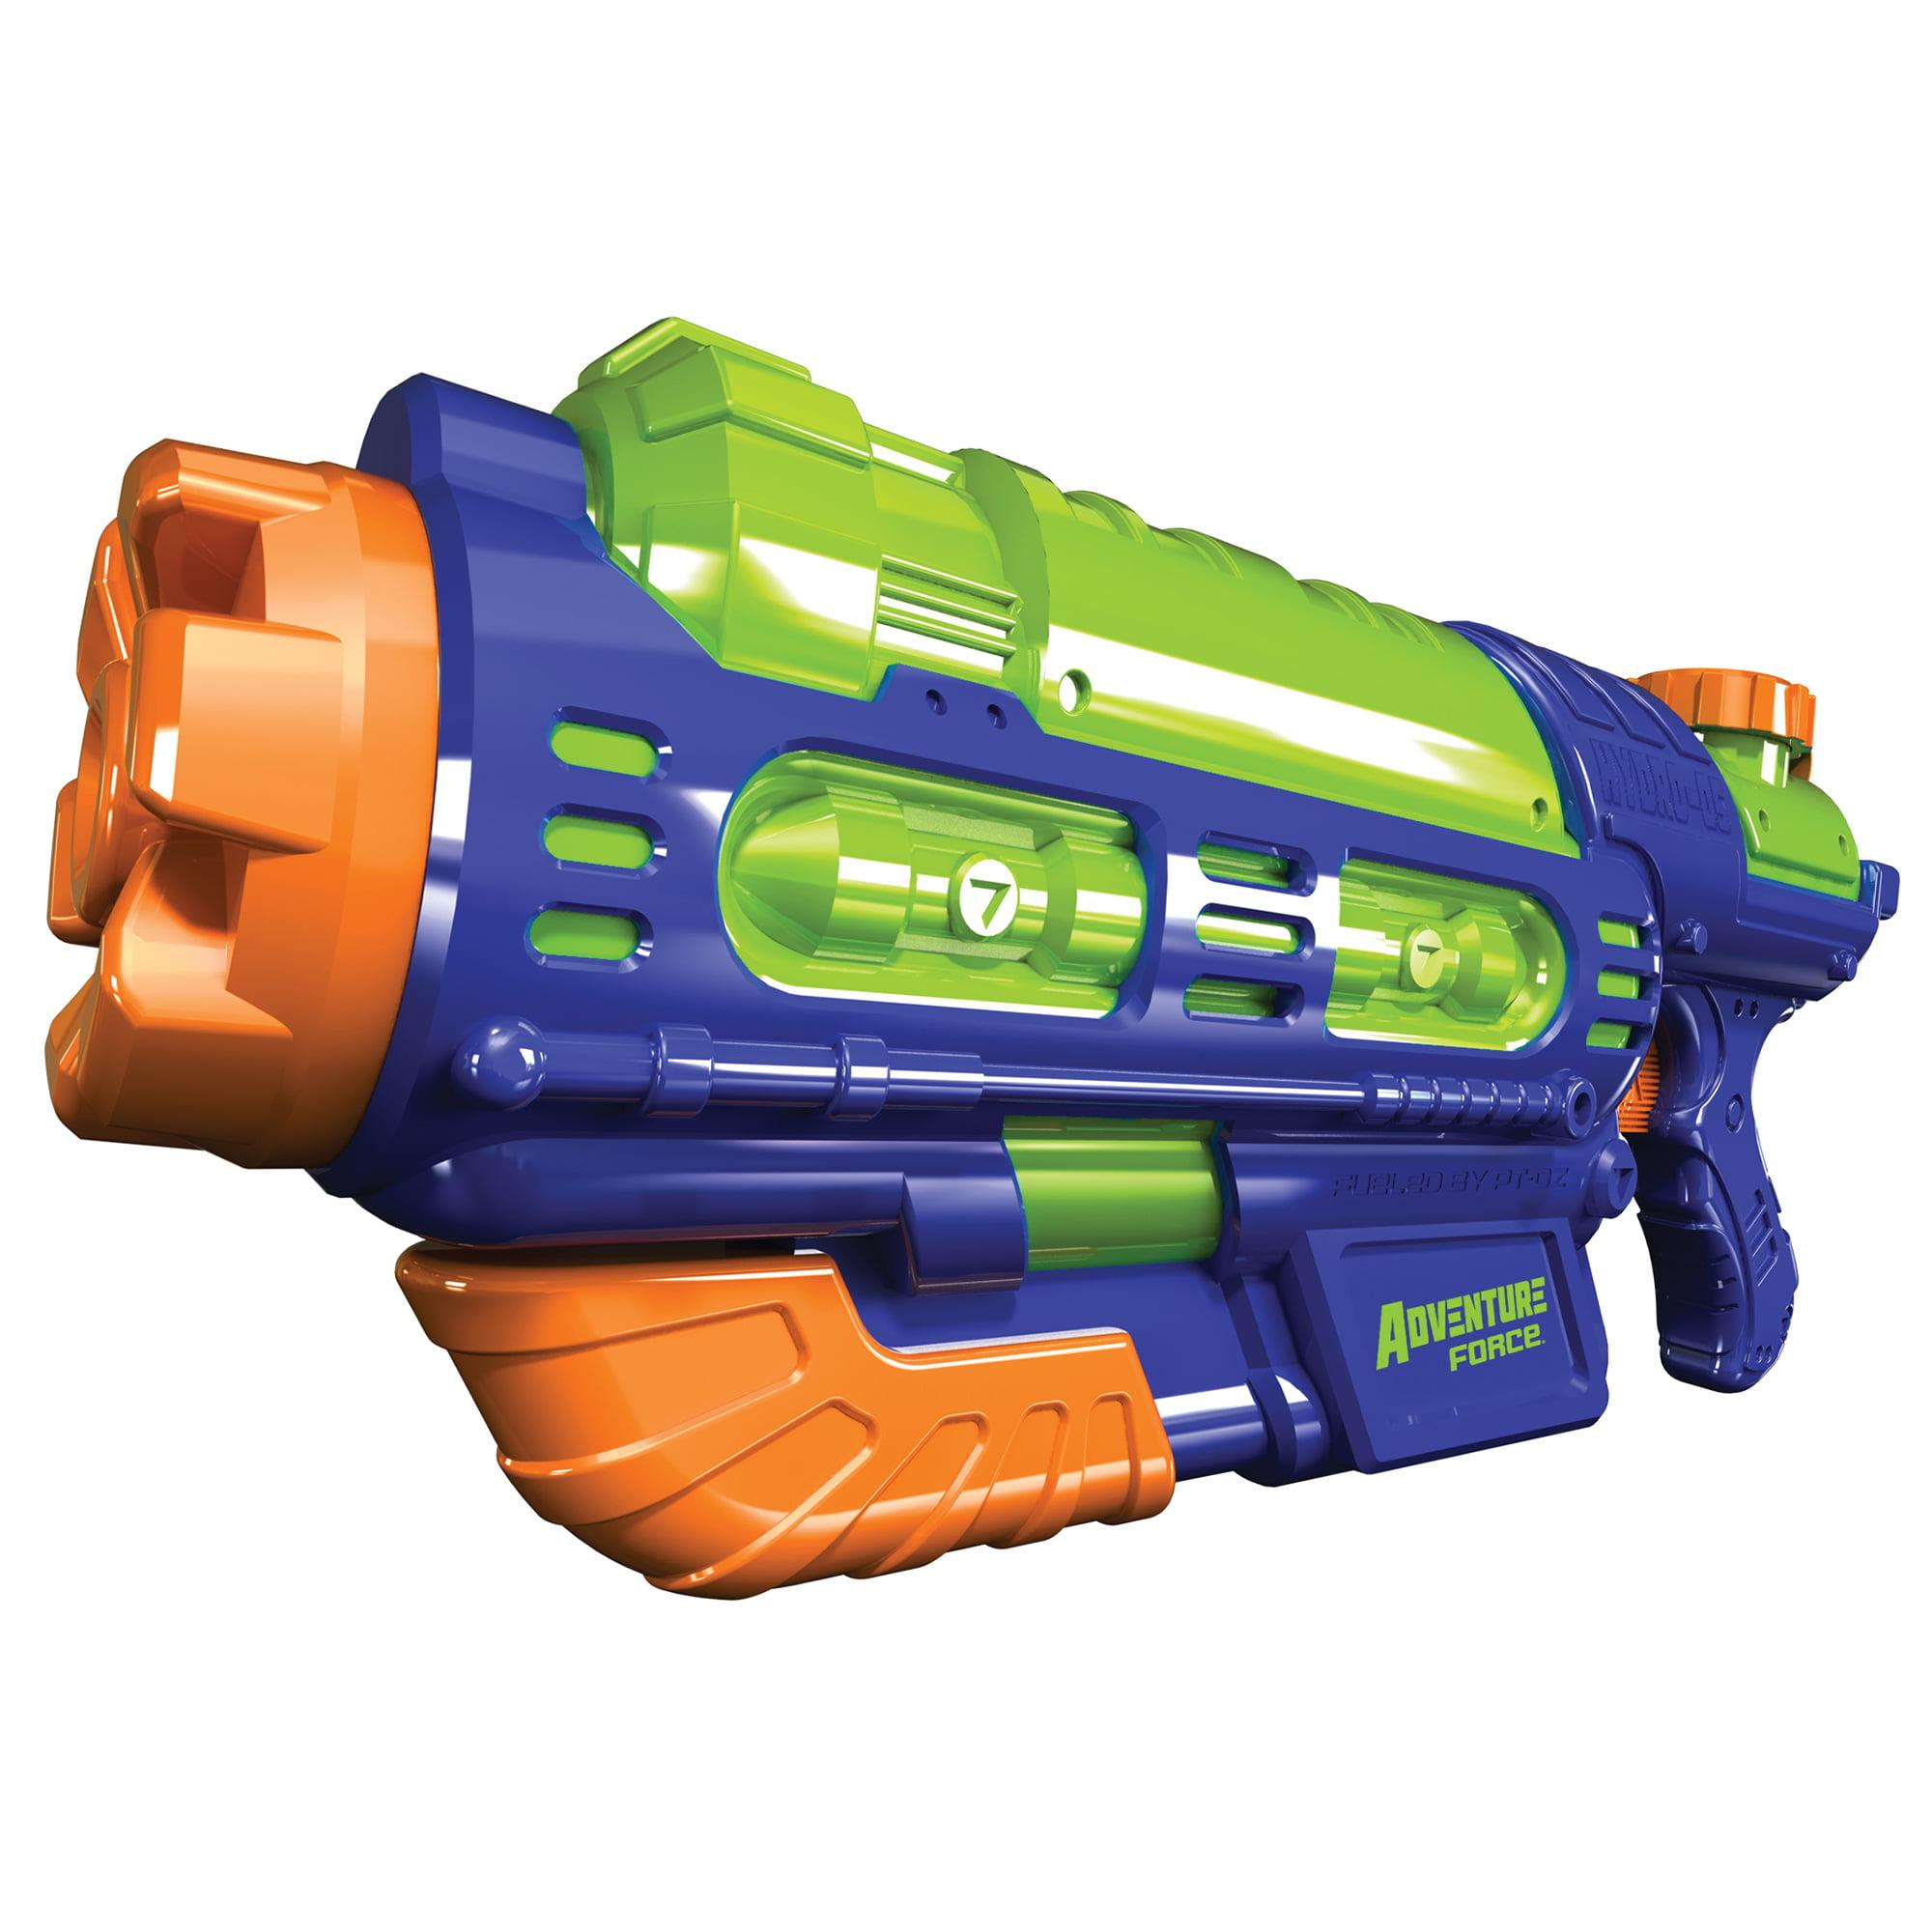 Adventure Force Hydro Blitz Power Pump Water Blaster